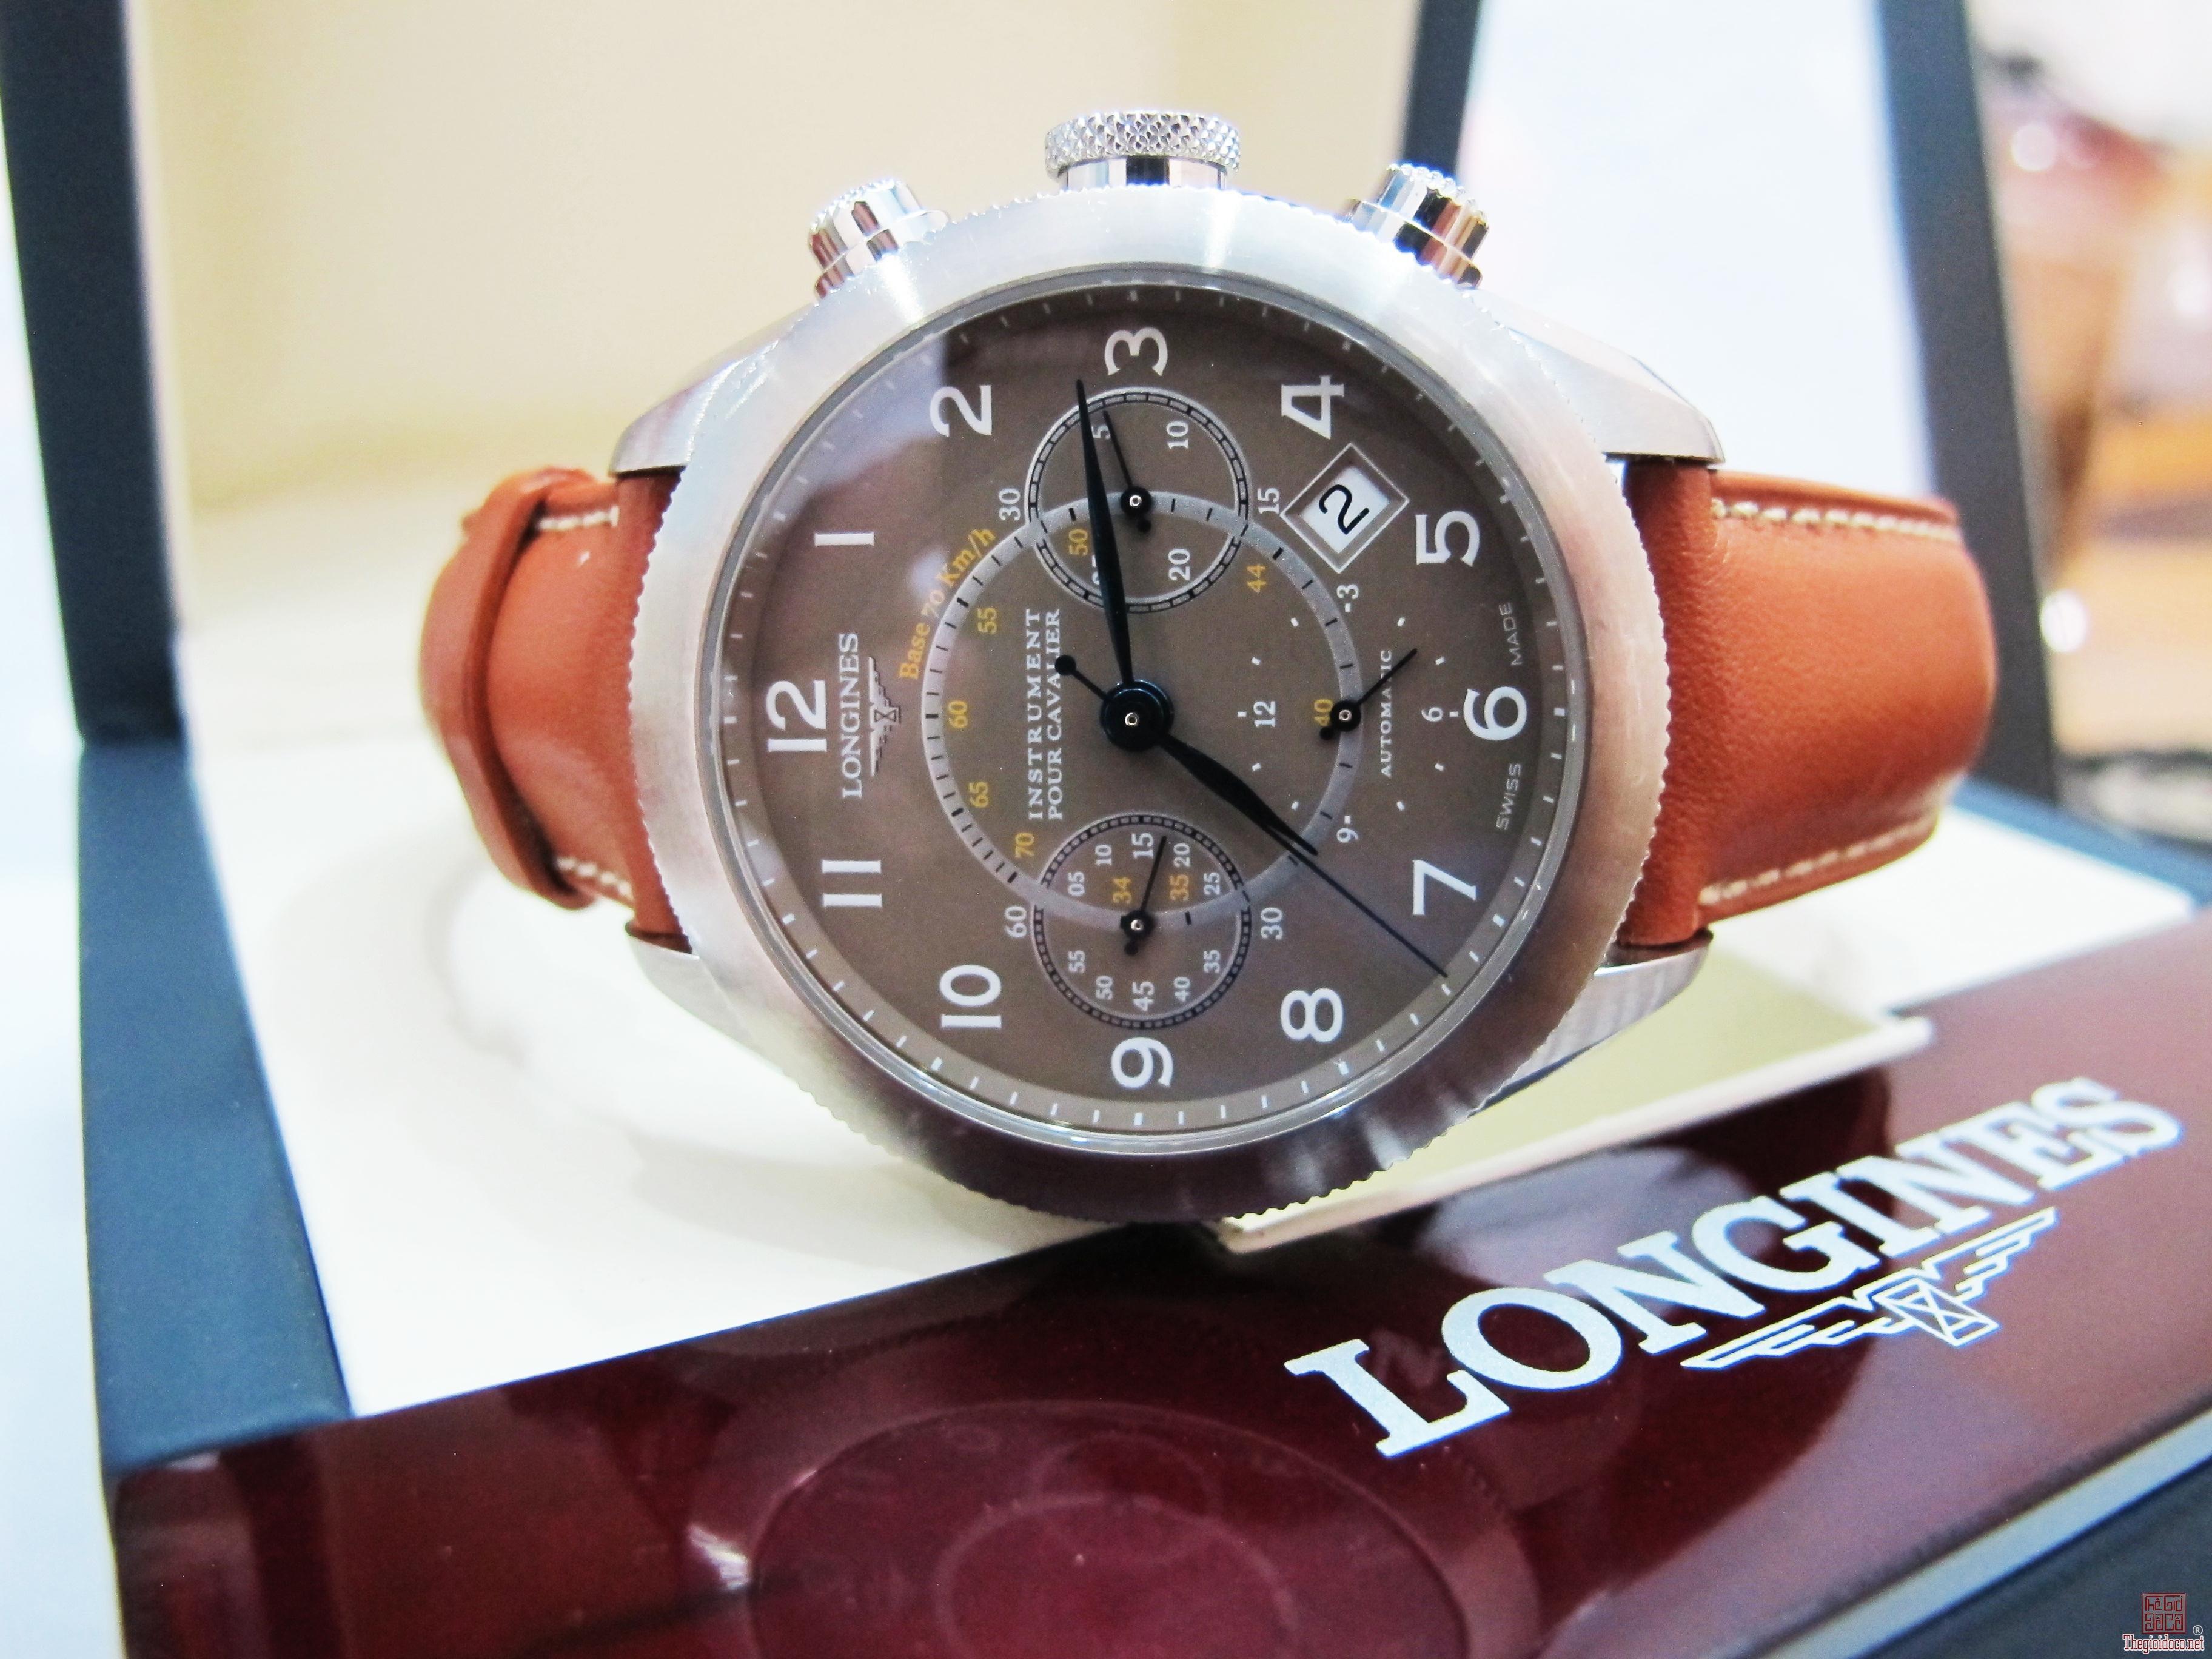 Longines Chronograph Nam automatic Dây da 6 kim ( Số học trò ) Fullbox giá rẻ